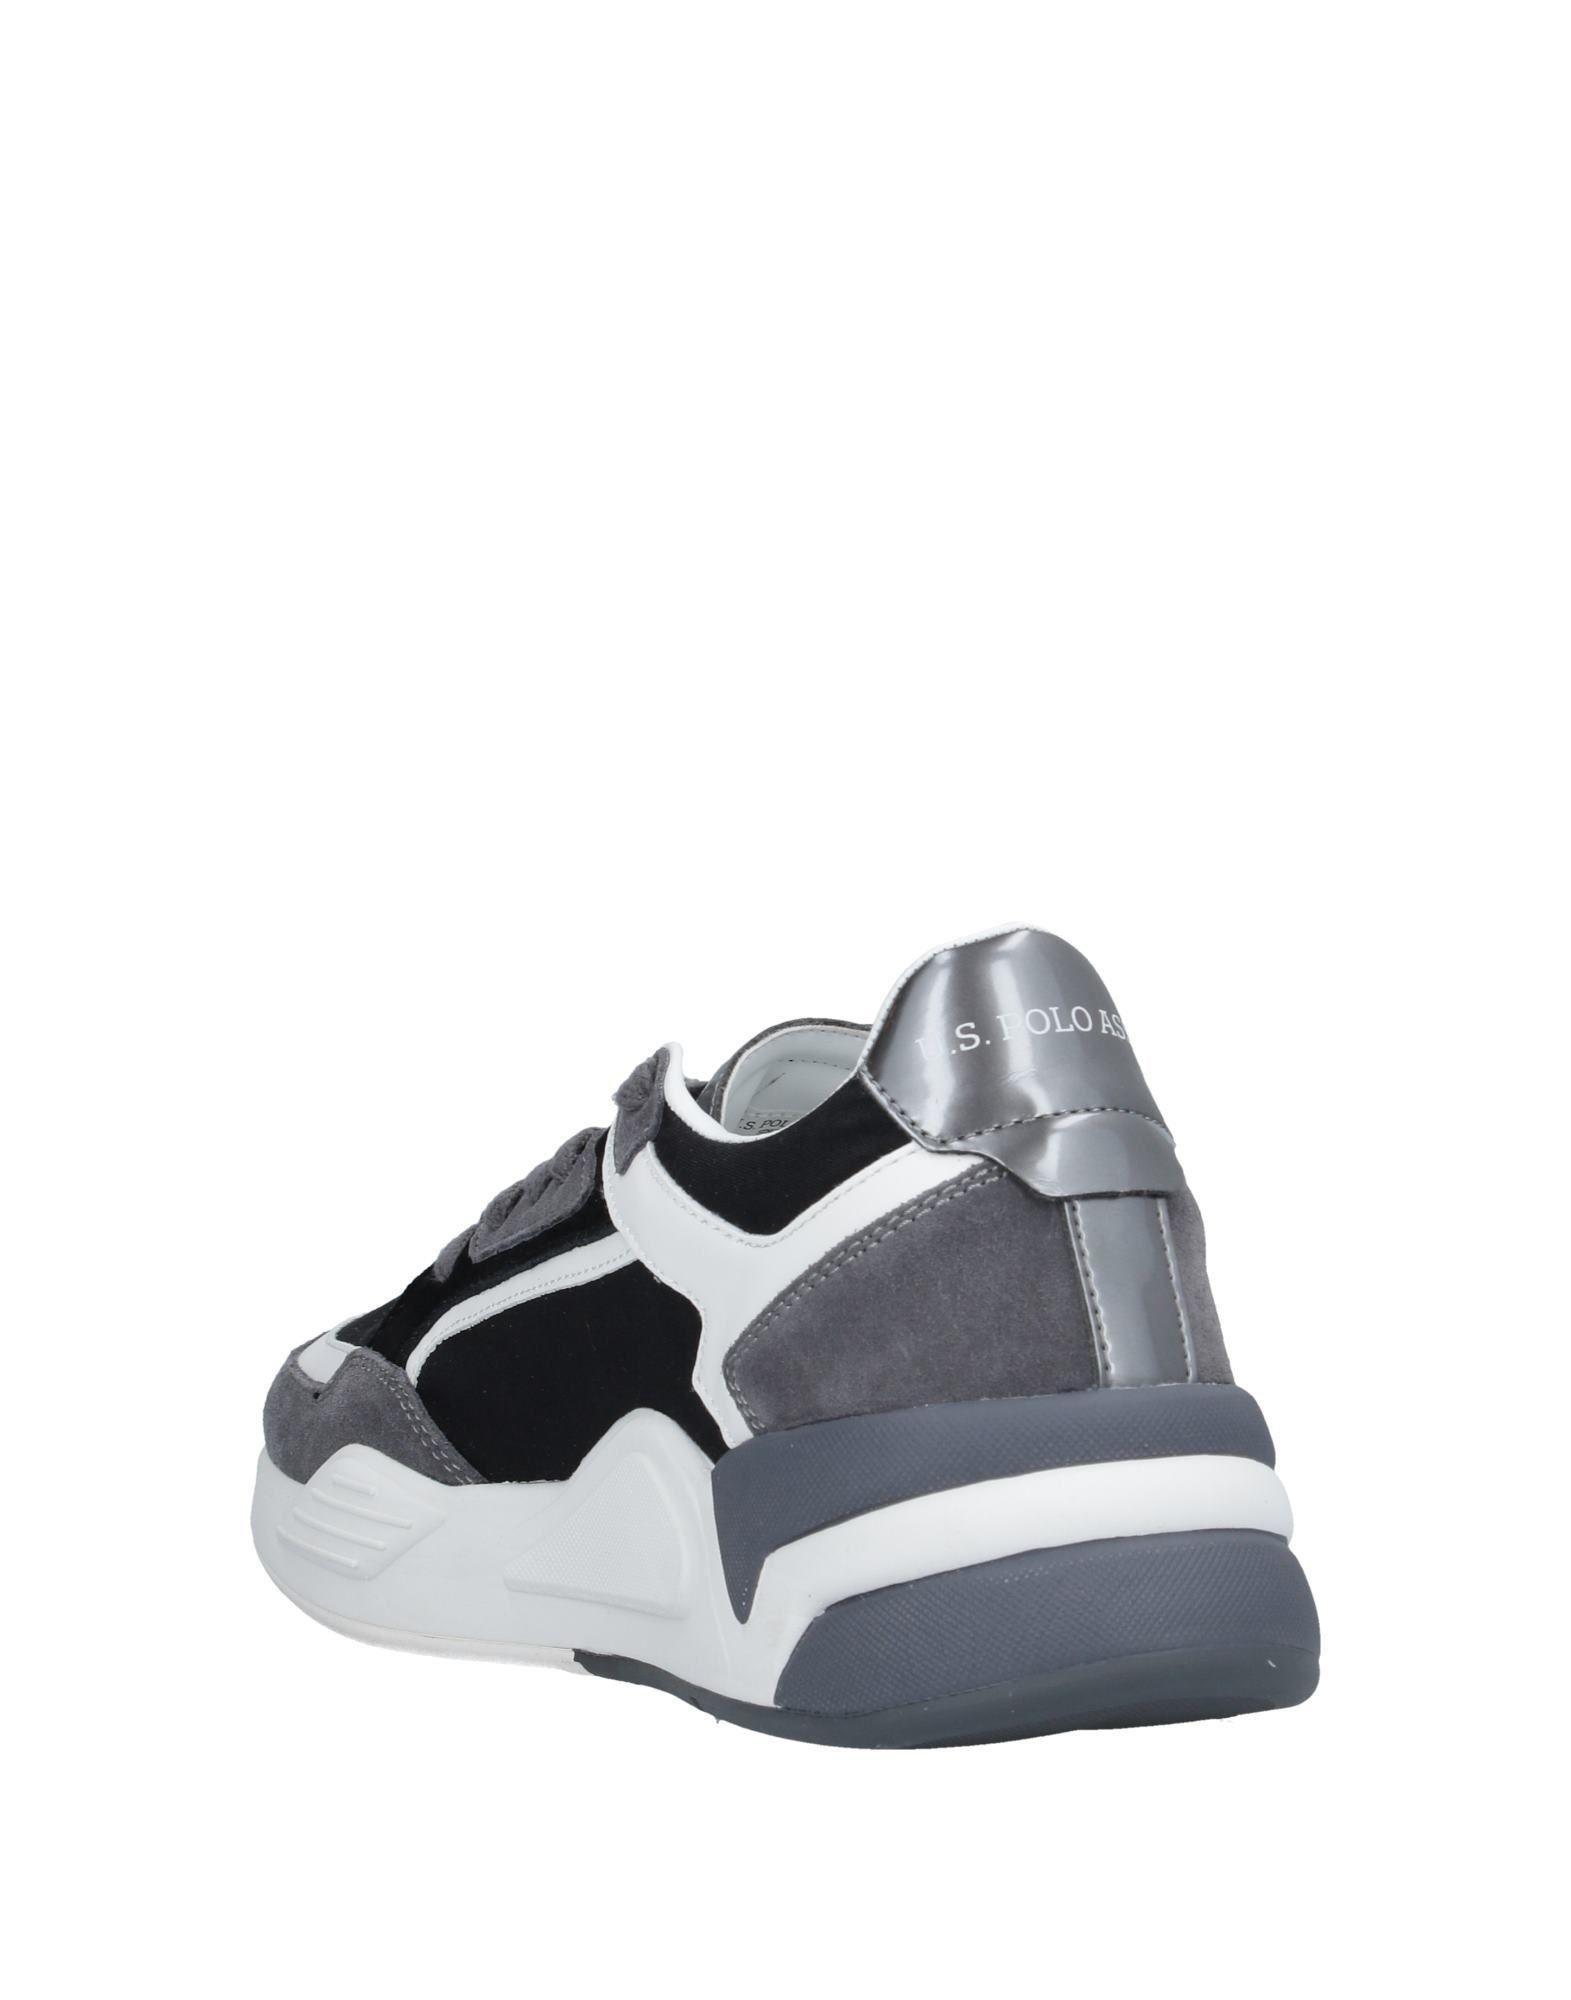 Sneakers & Deportivas U.S. POLO ASSN. de hombre de color Gris